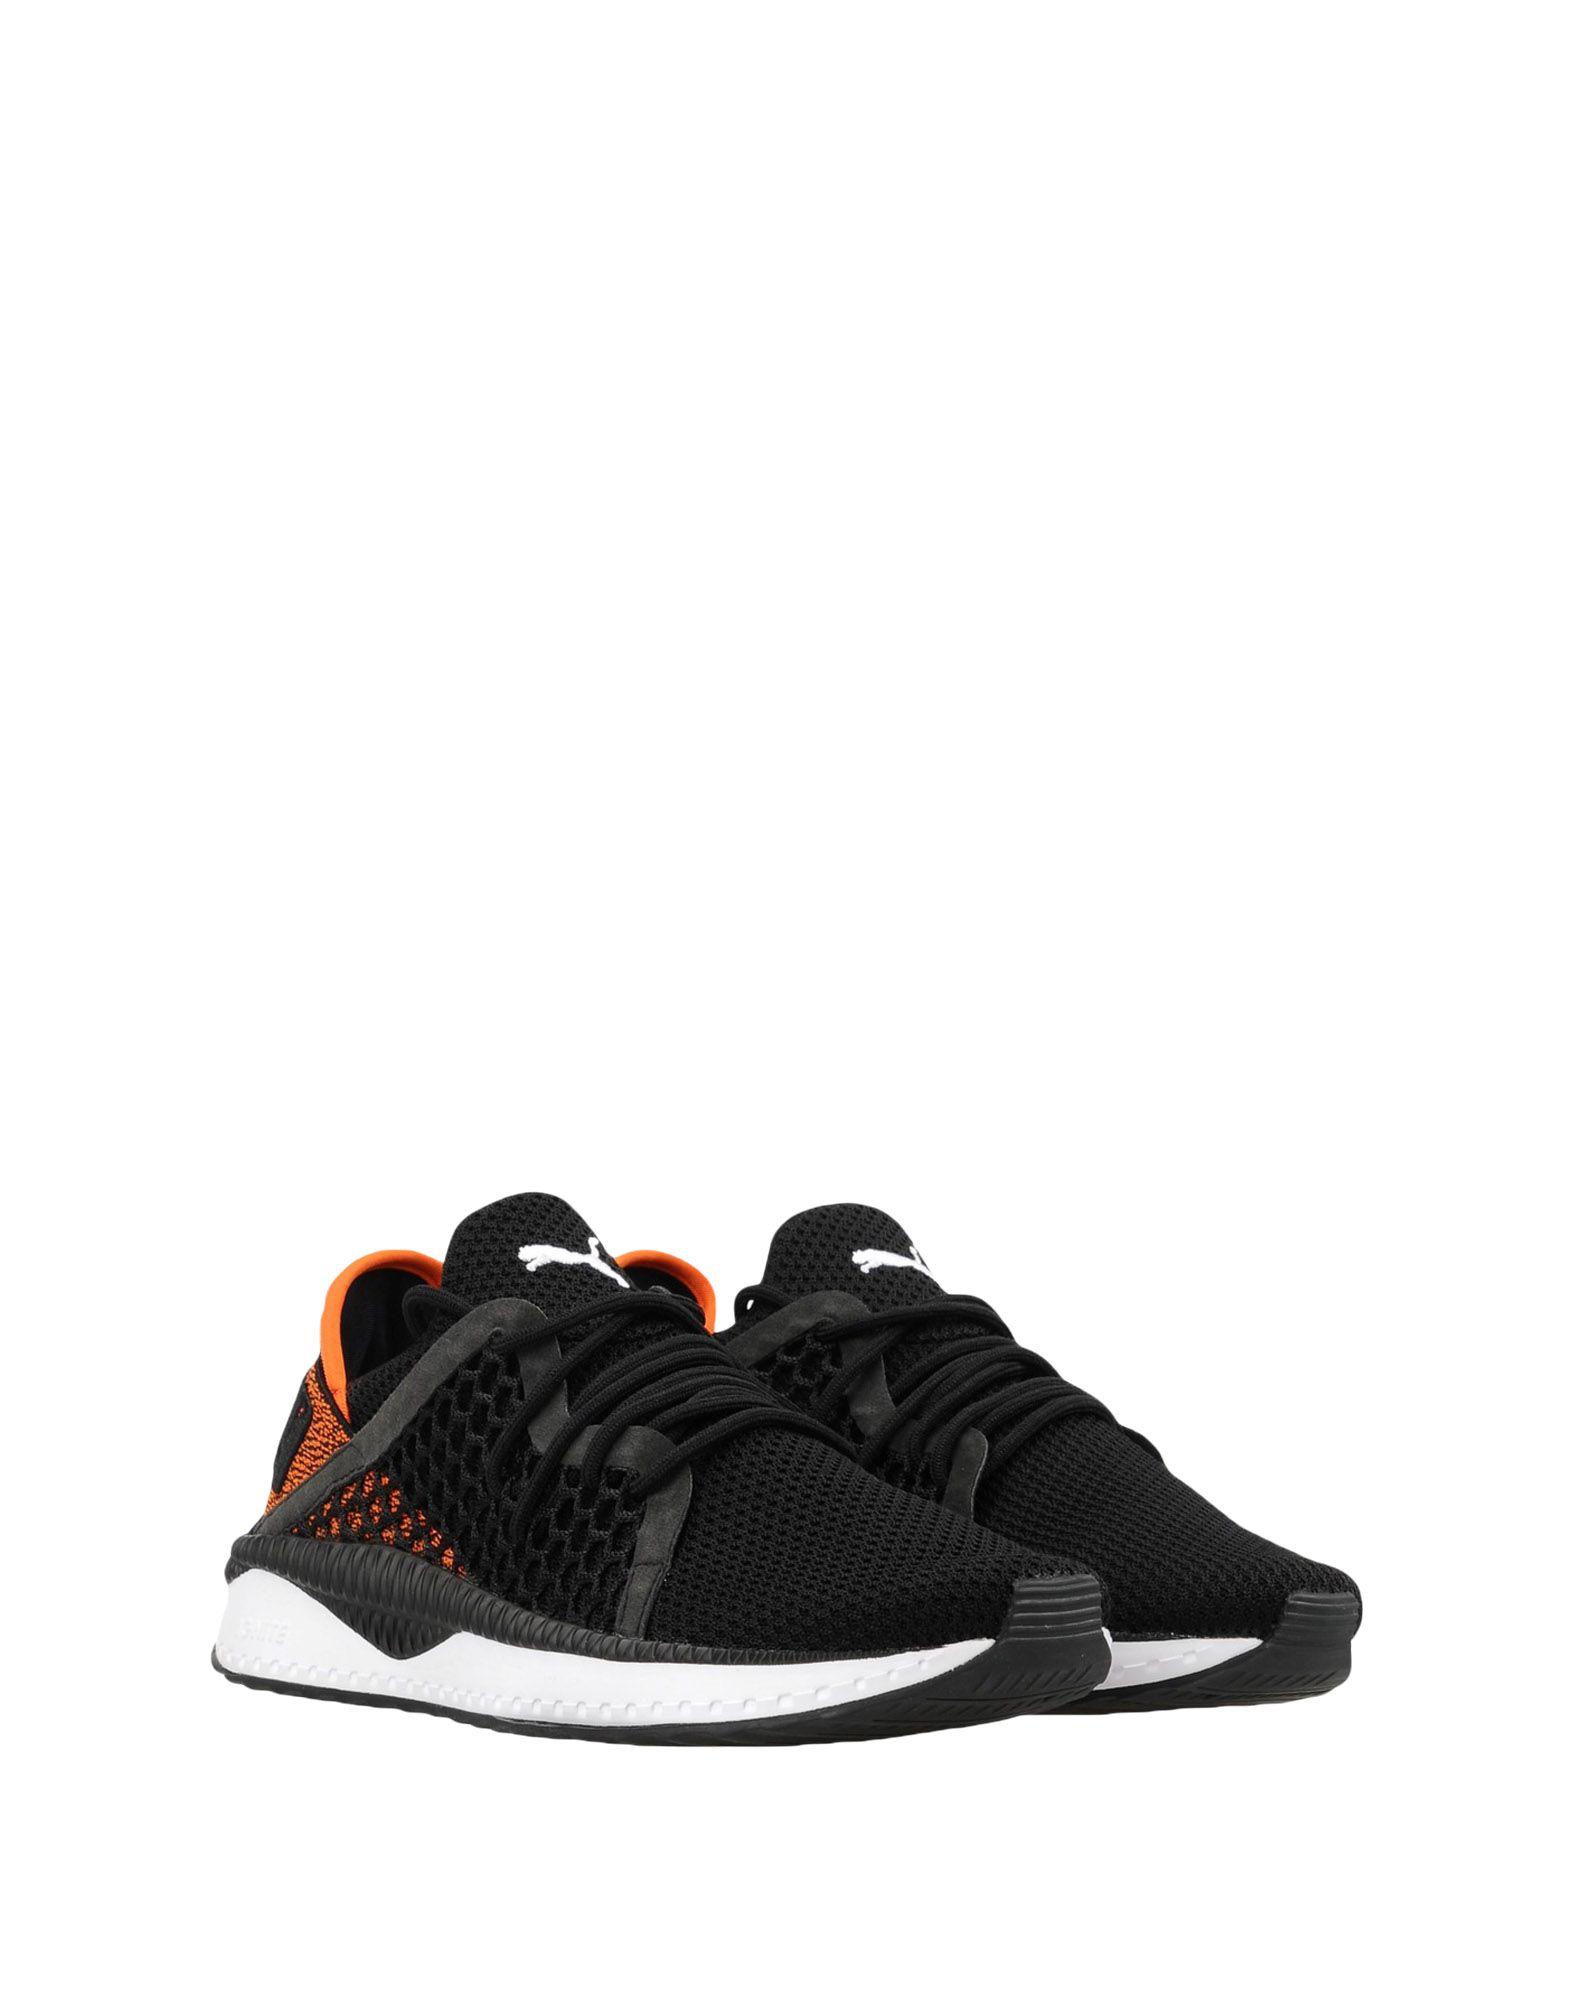 Sneakers Puma Tsugi Netfit - Homme - Sneakers Puma sur